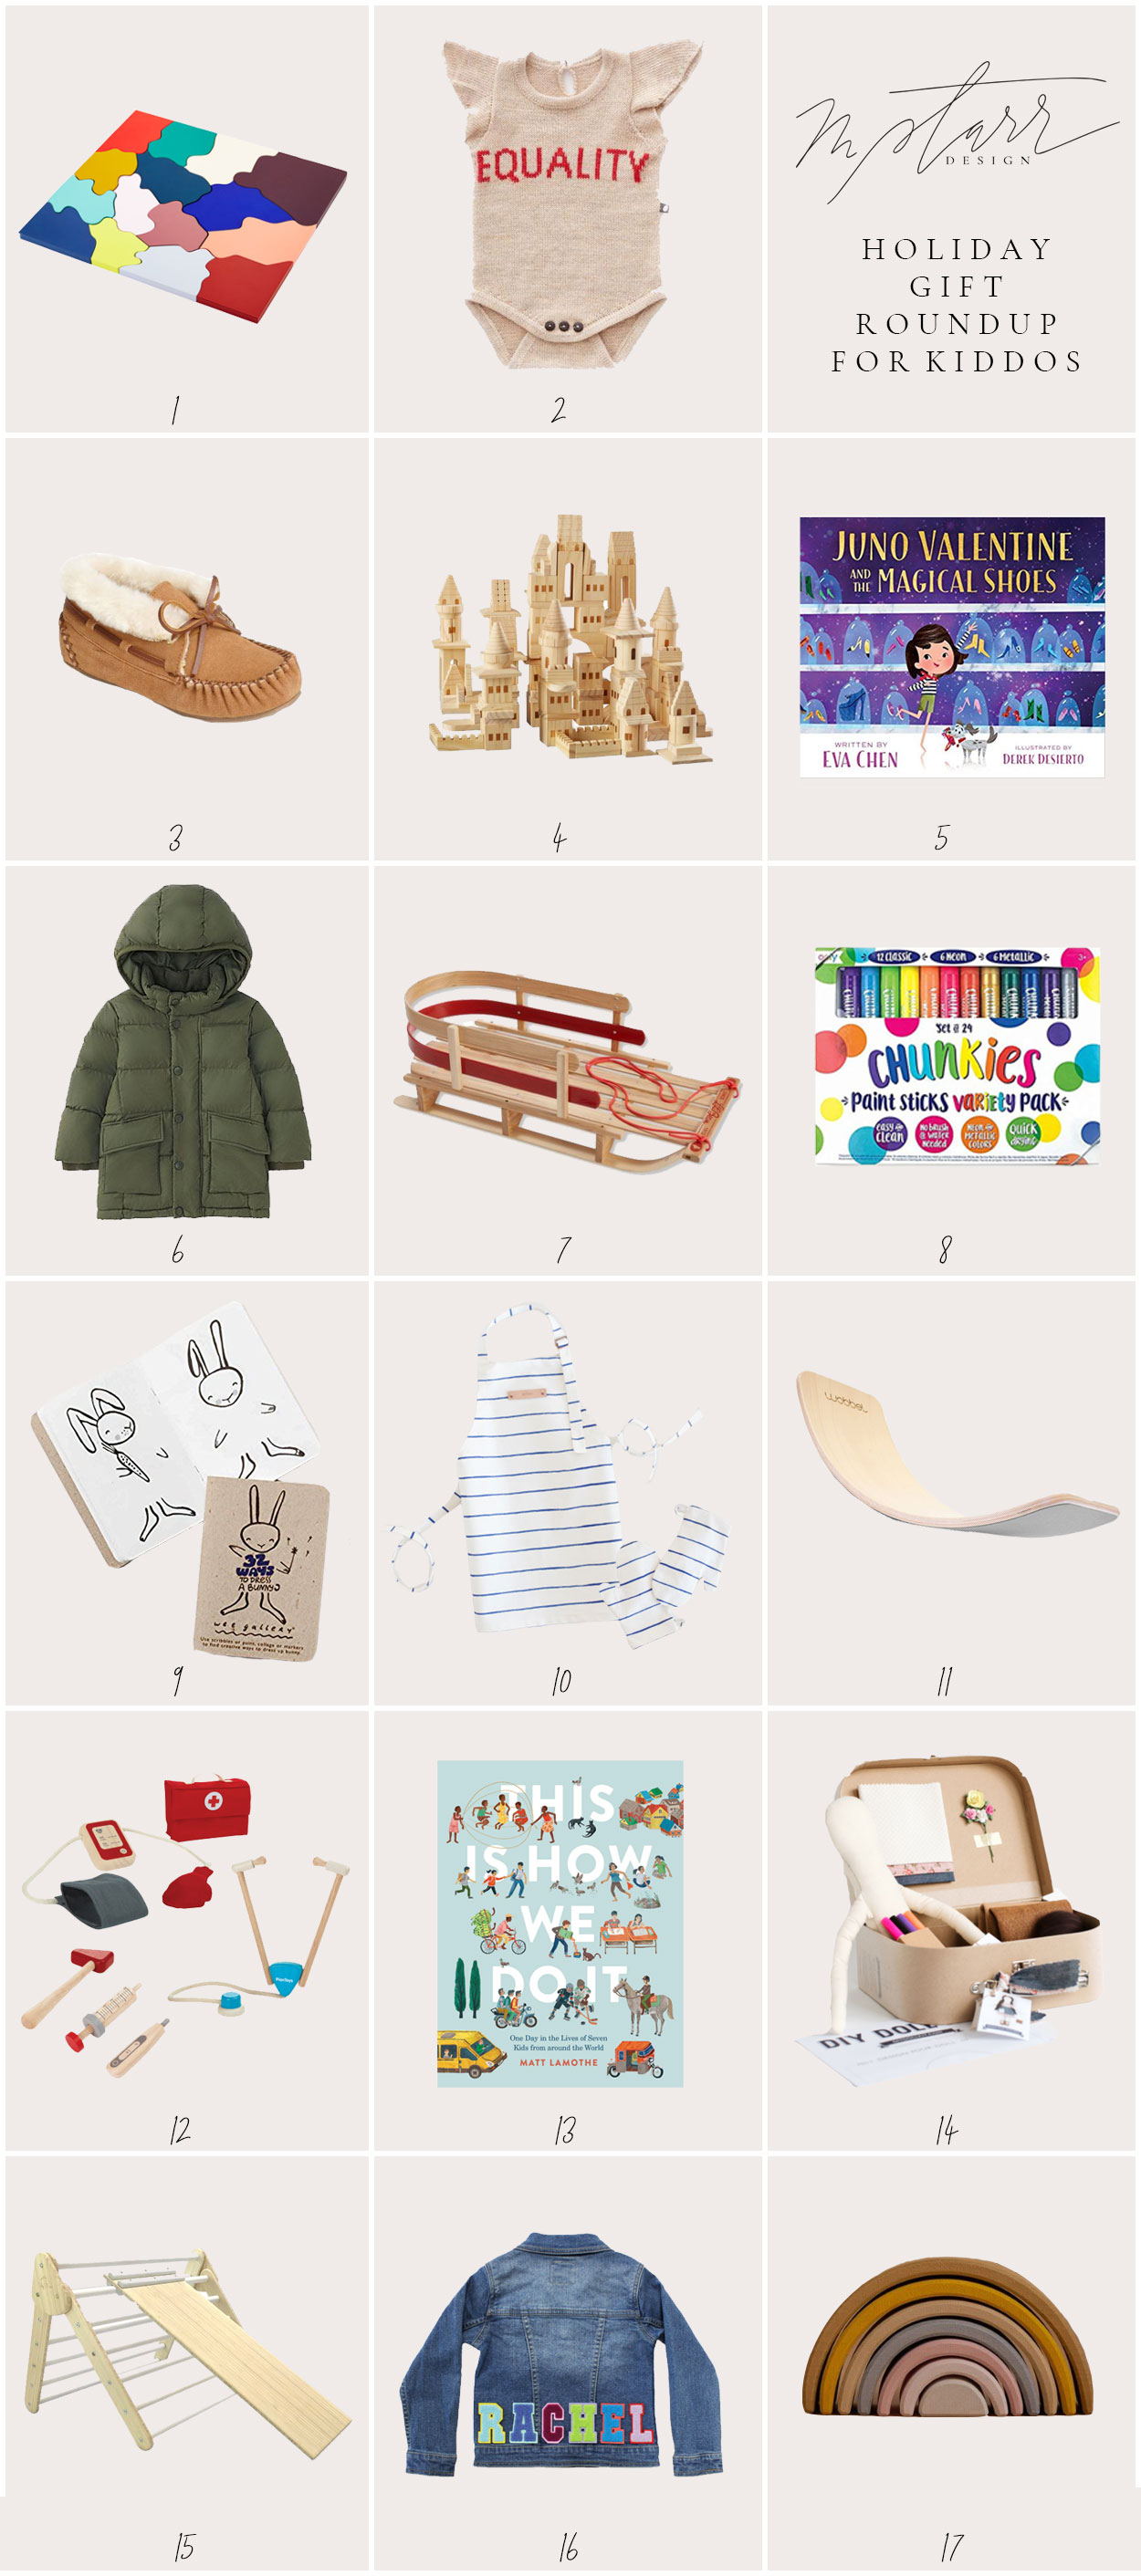 holiday_gift_roundup_littles_mStarr.jpg